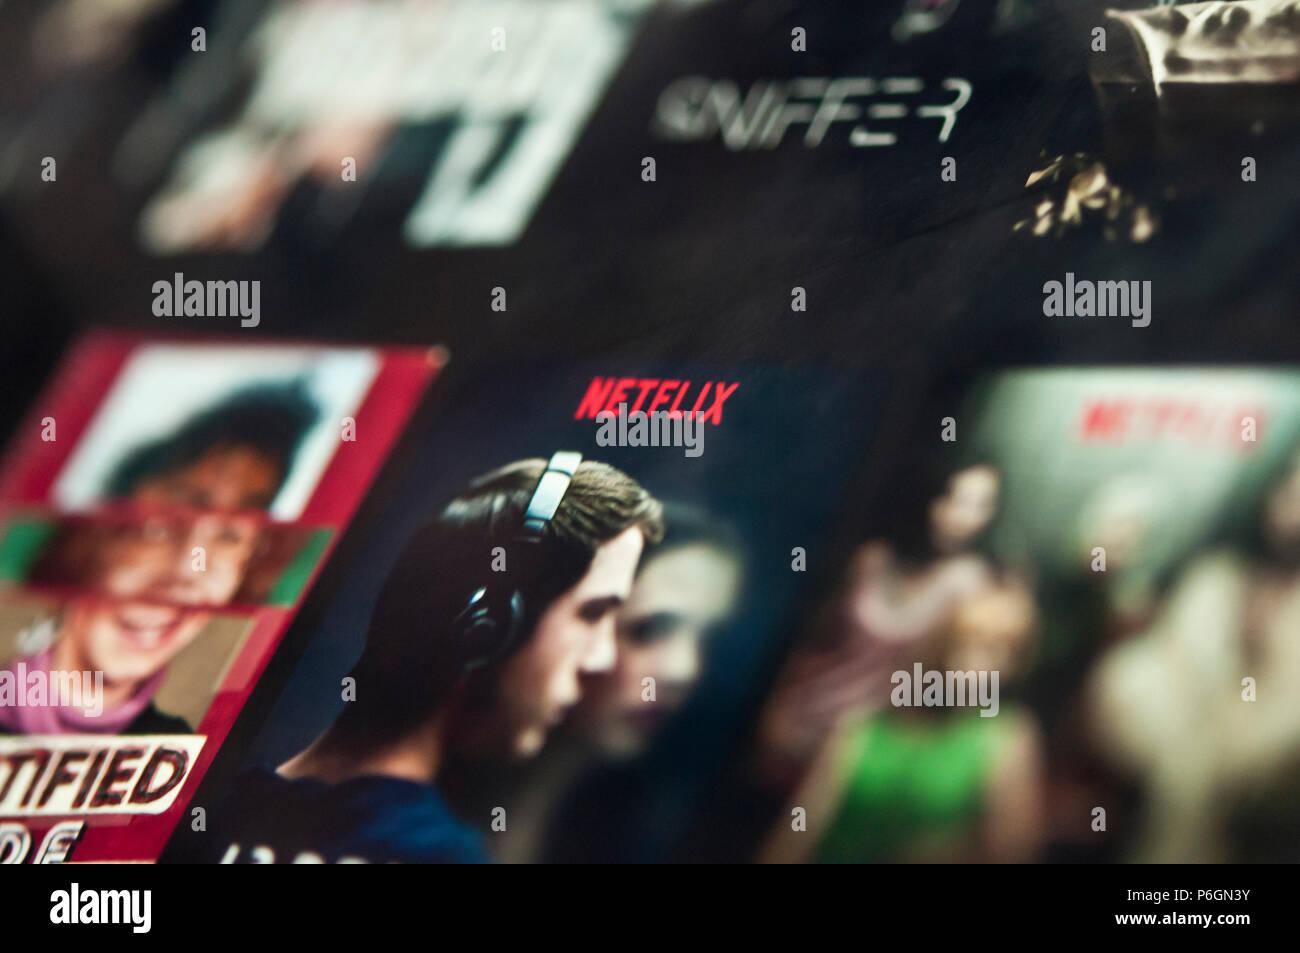 Pantalla Netflix Imagen De Stock